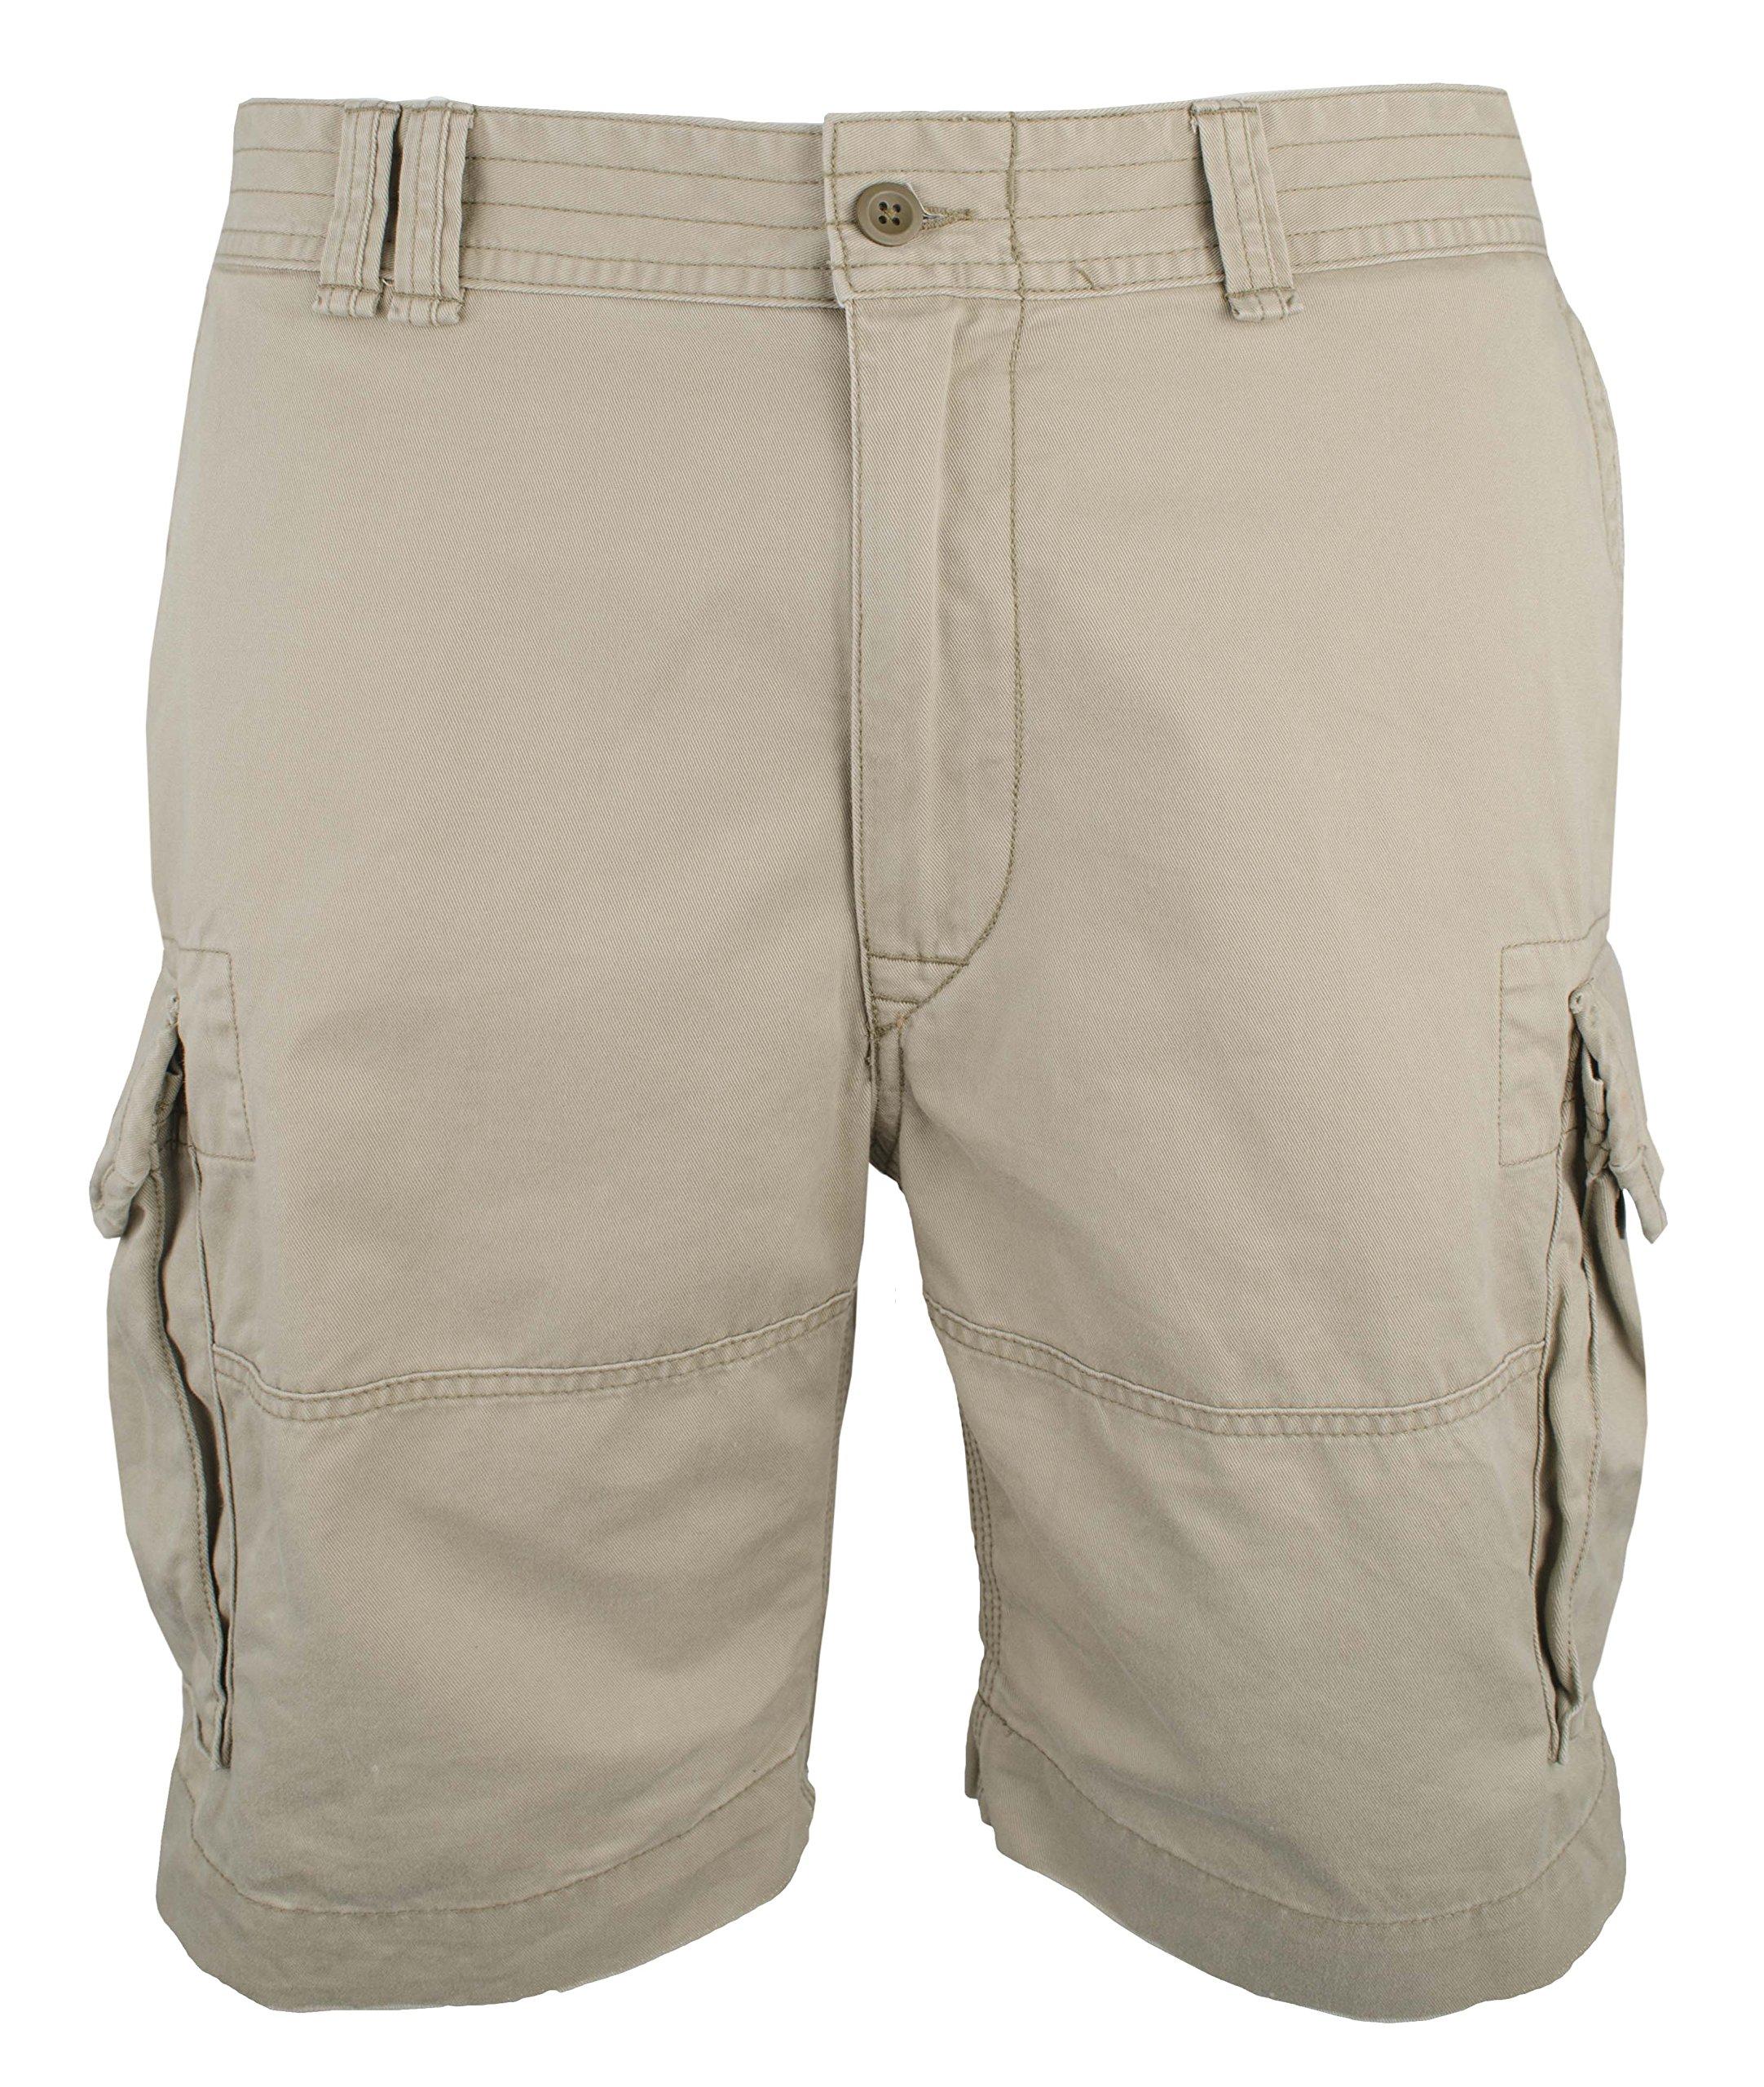 Polo Ralph Lauren Men's Big And Tall Gellar Cargo Shorts, Hudson Tan, 50B